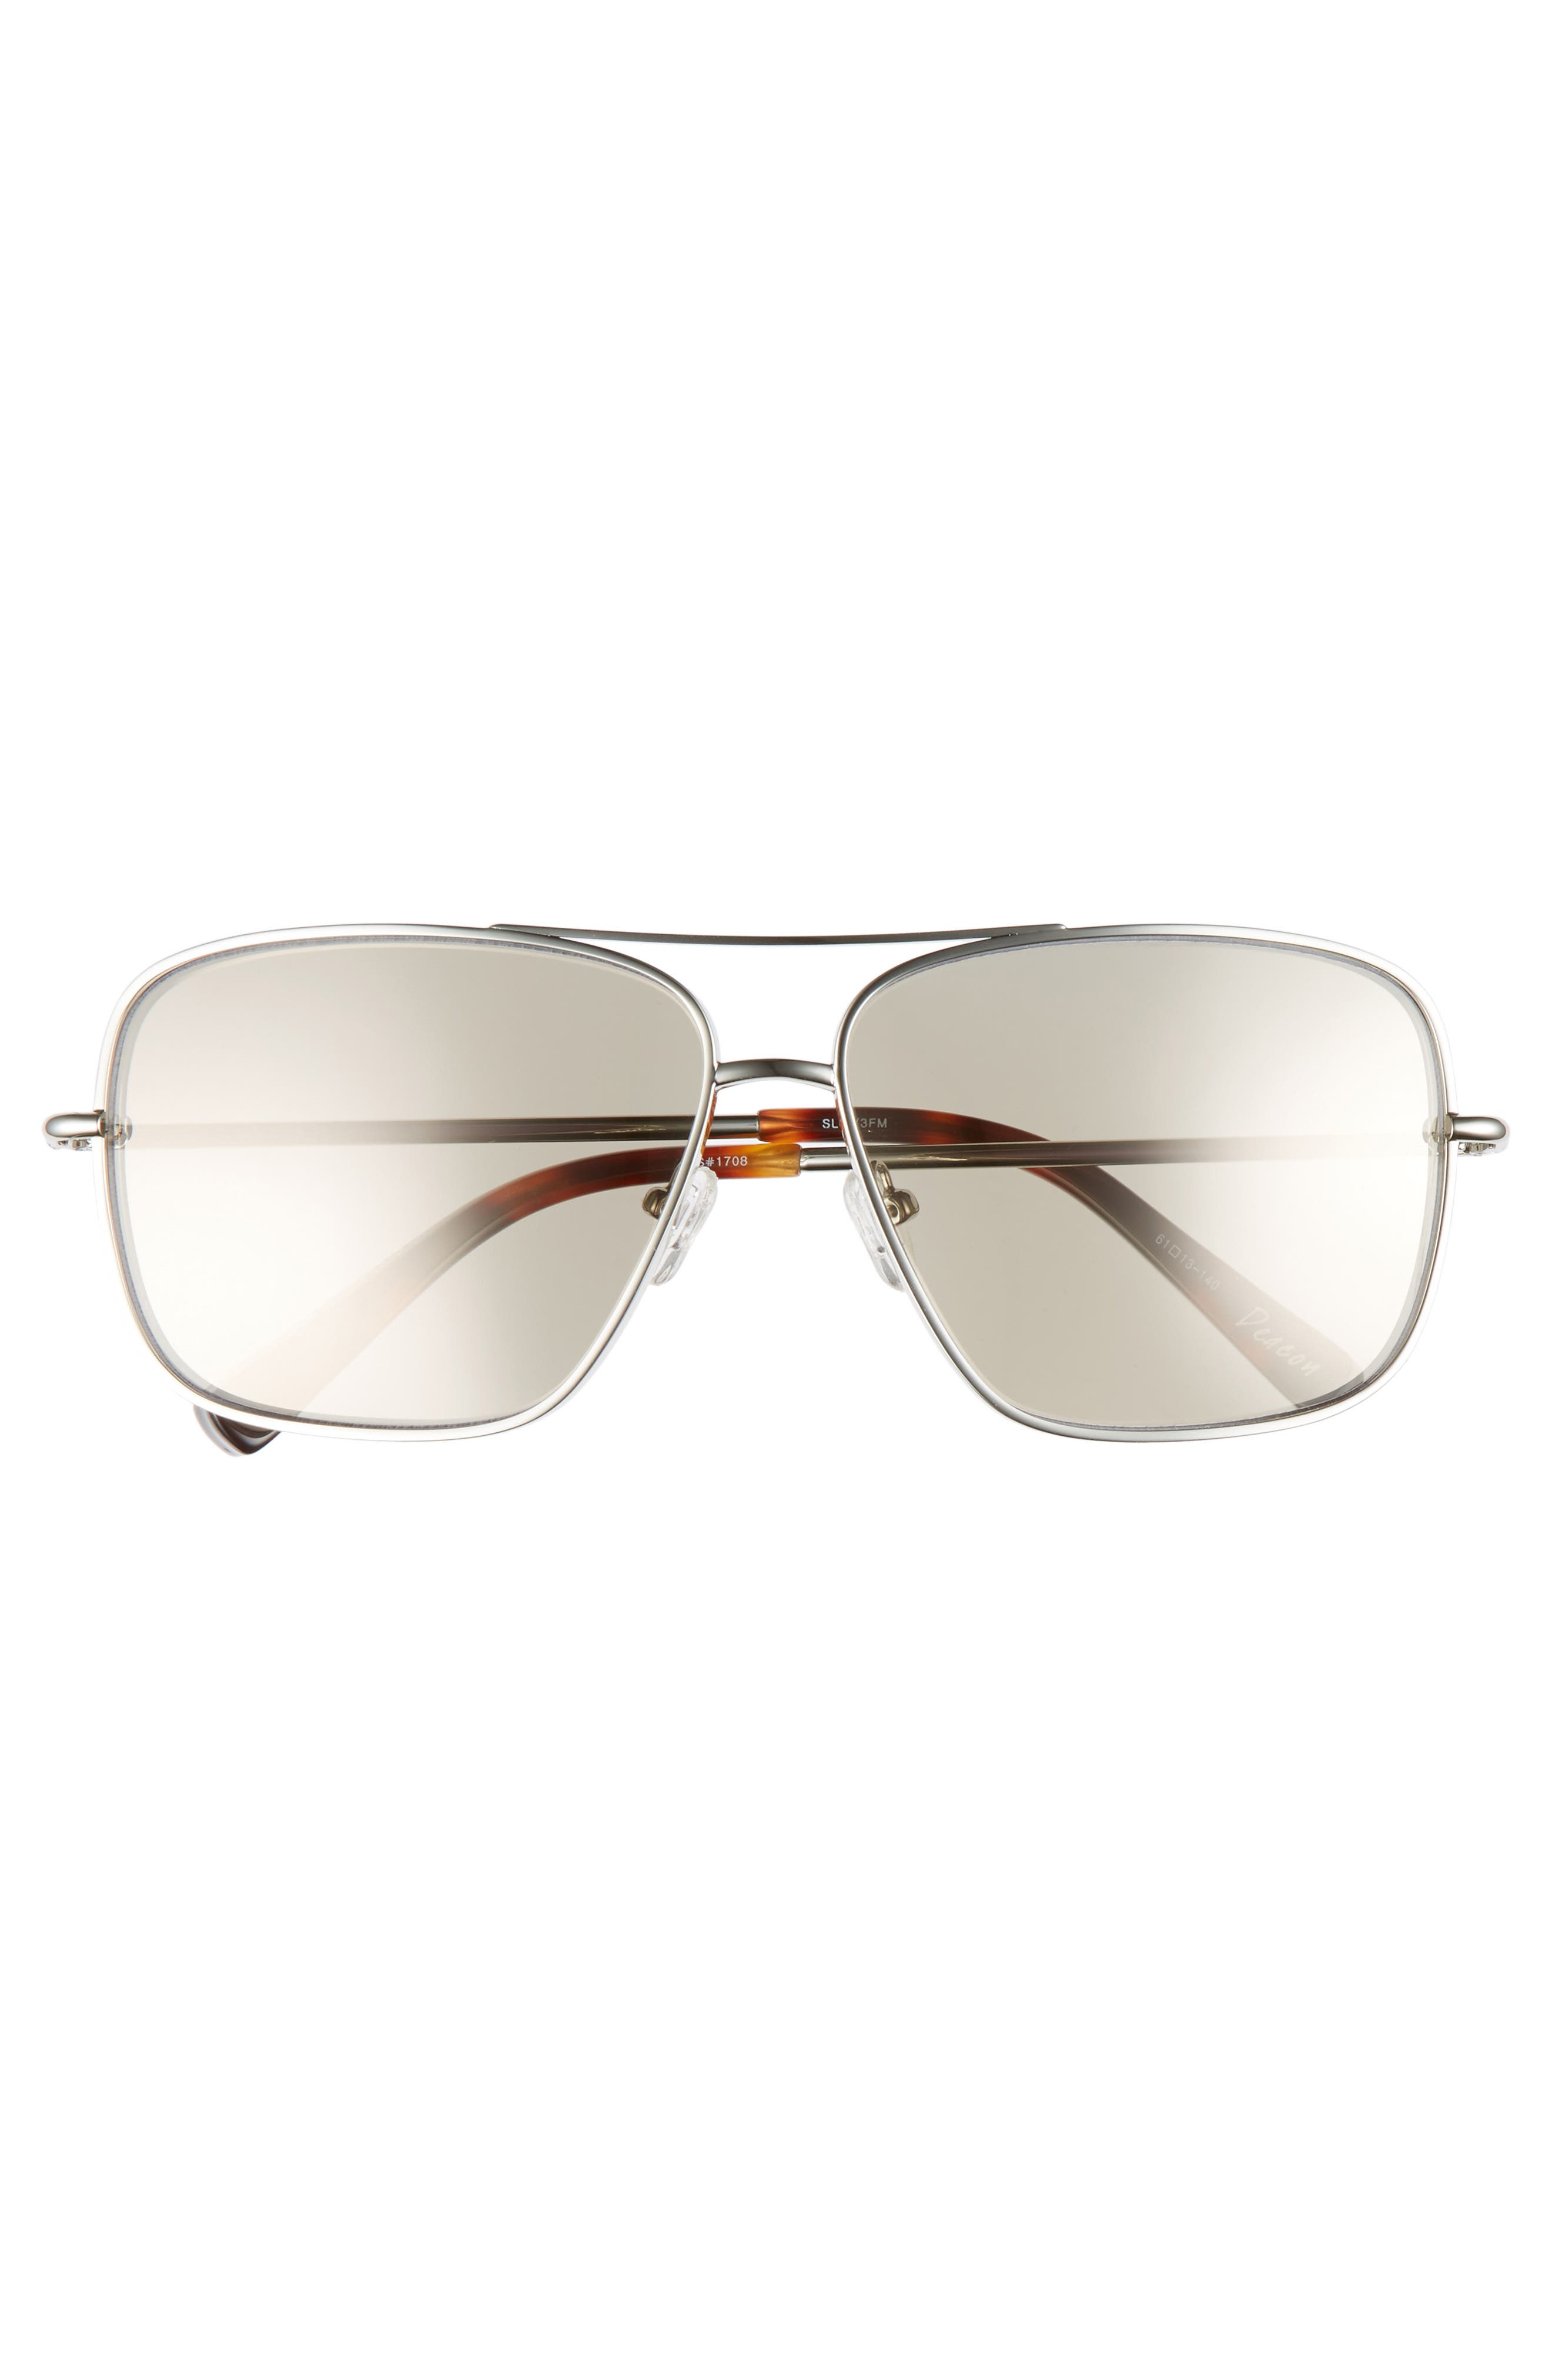 Deacon 61mm Aviator Sunglasses,                             Alternate thumbnail 3, color,                             Silver